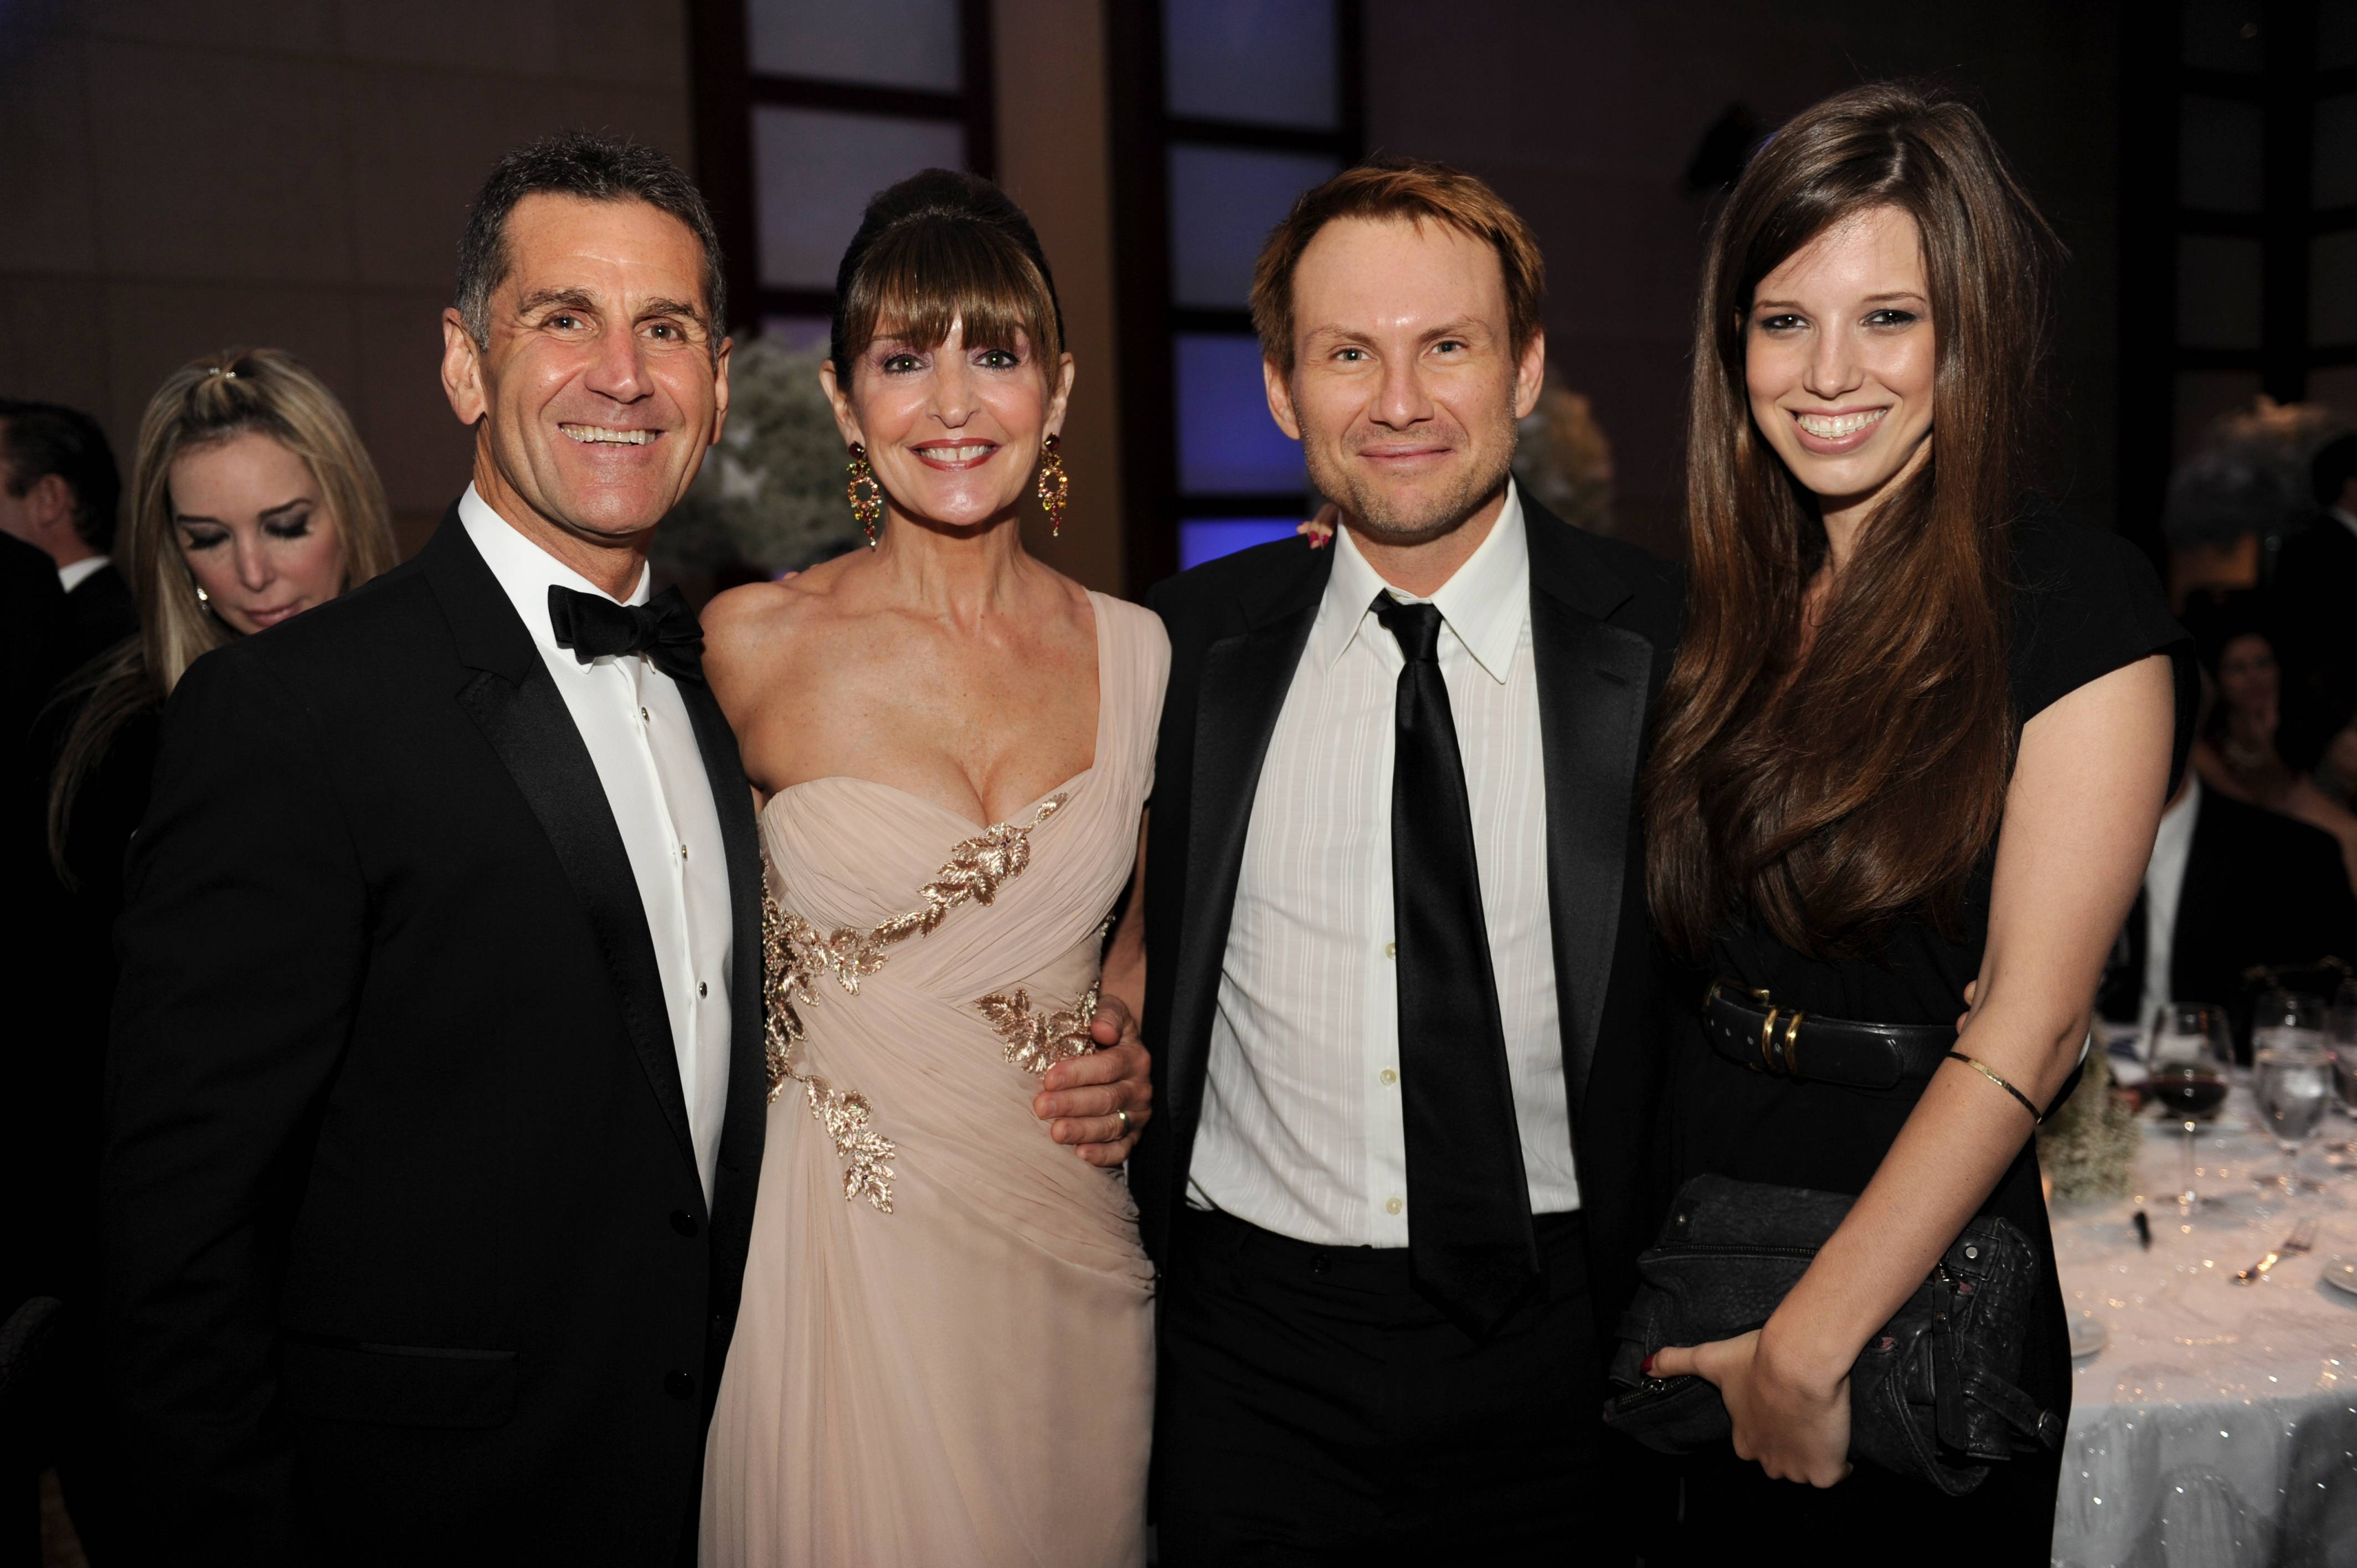 Richard & Beth Tasca, Christian Slater & Brittany Lopez